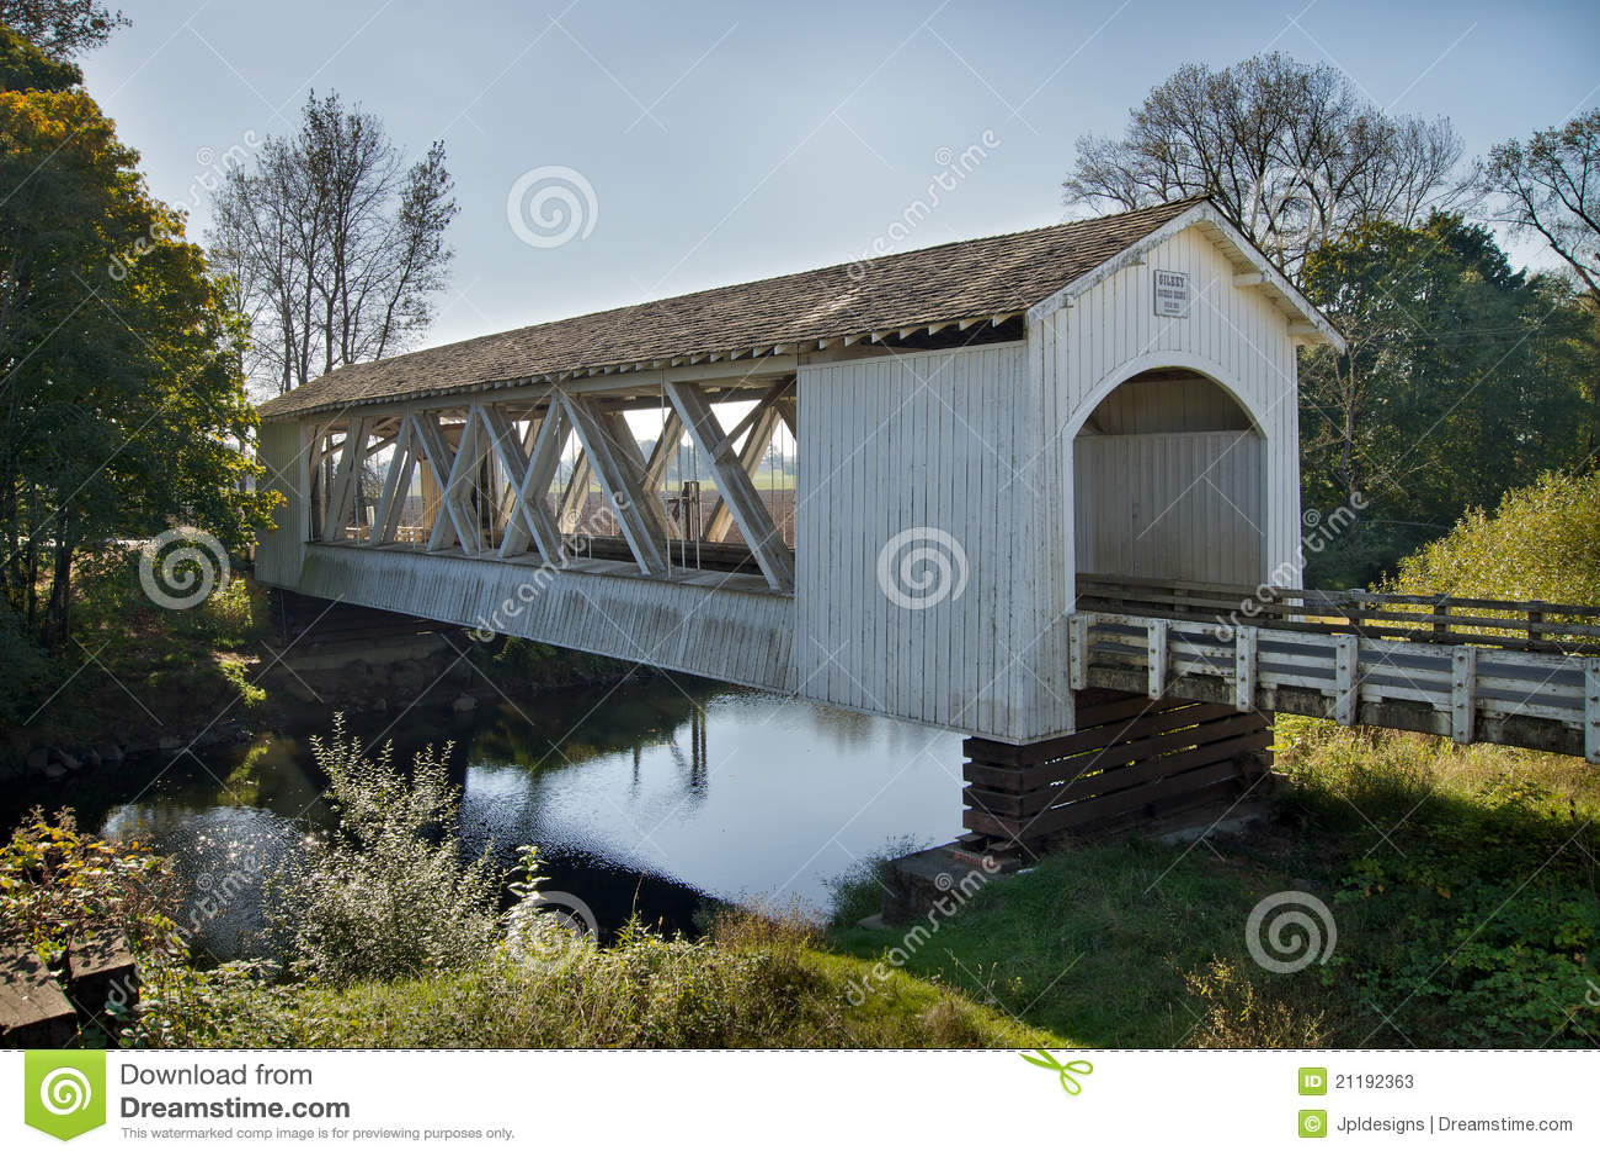 Giilkey Covered Bridge in Oregon